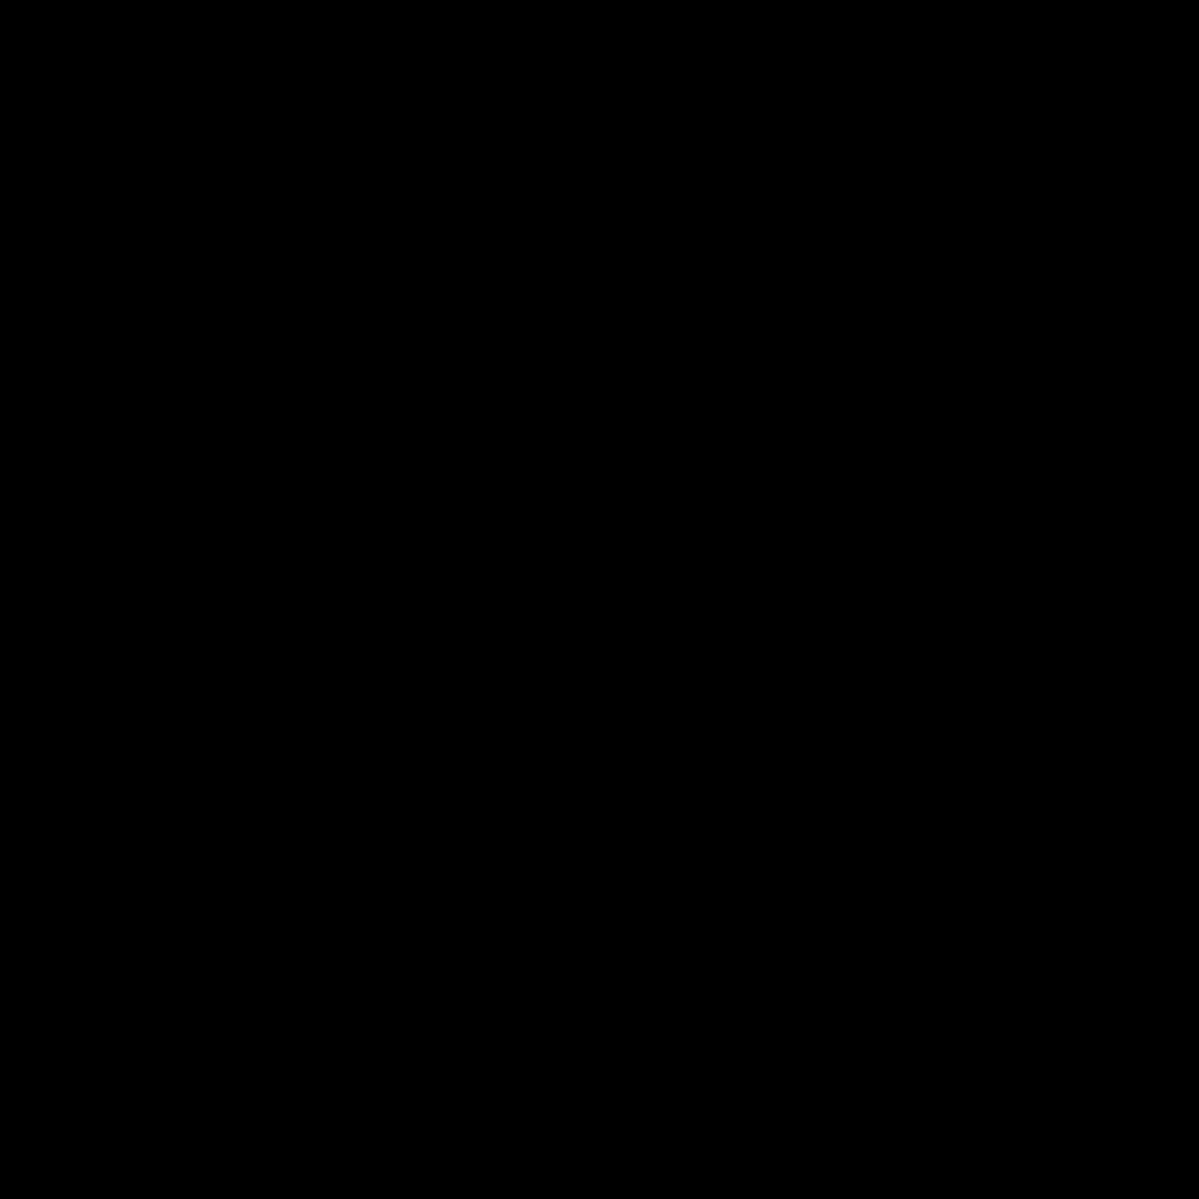 vectorising existing Logo